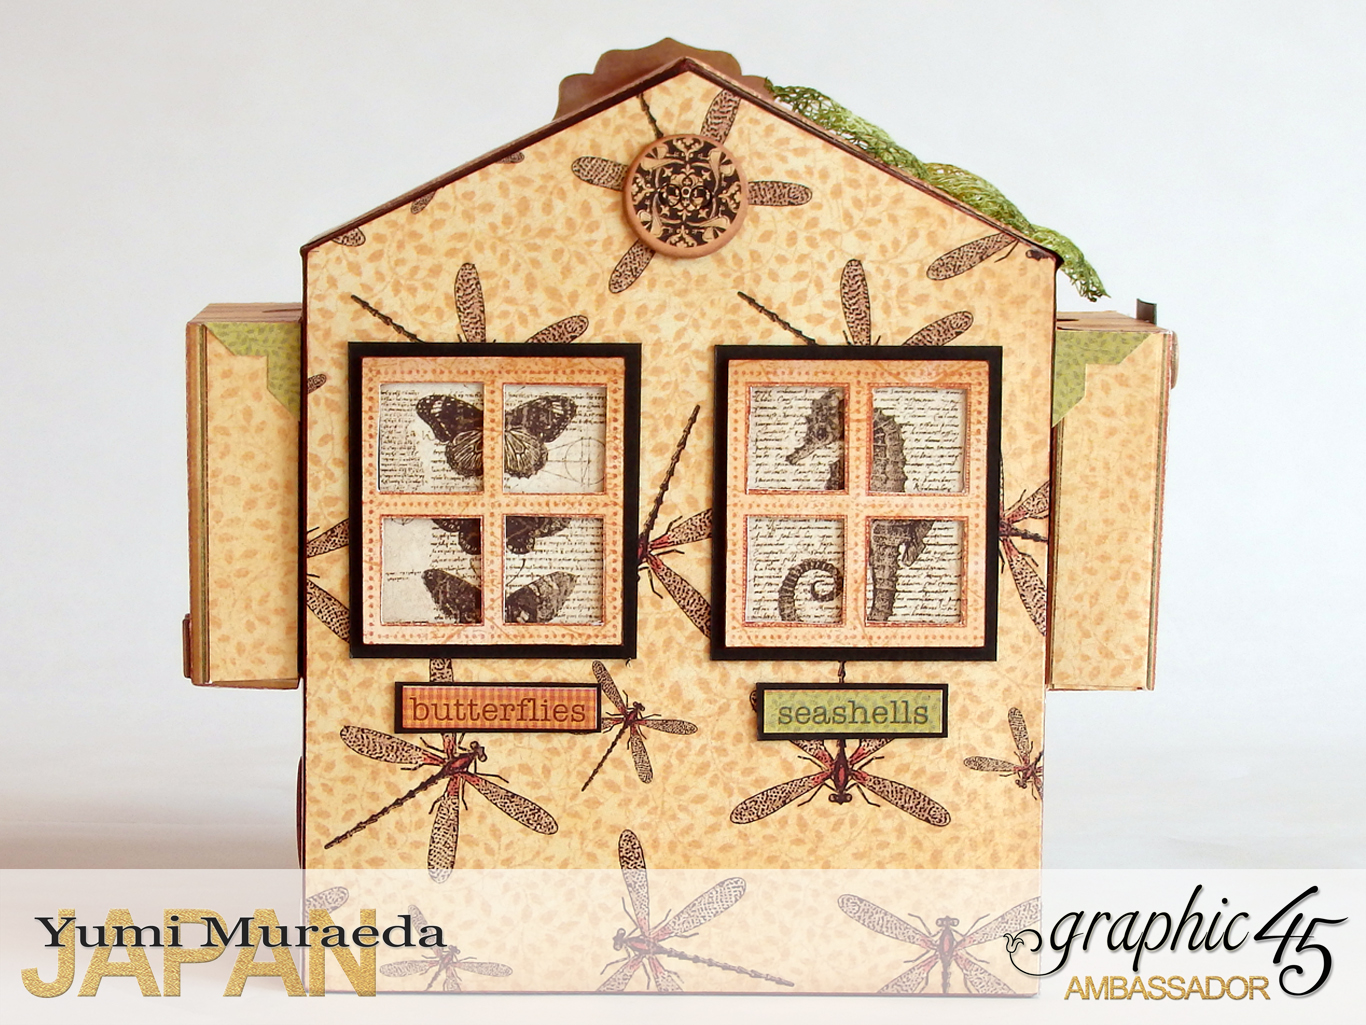 3Secret Gaden Museum, Botanicabella, by Yumi Muraeda, Product by Graphic 45jpg